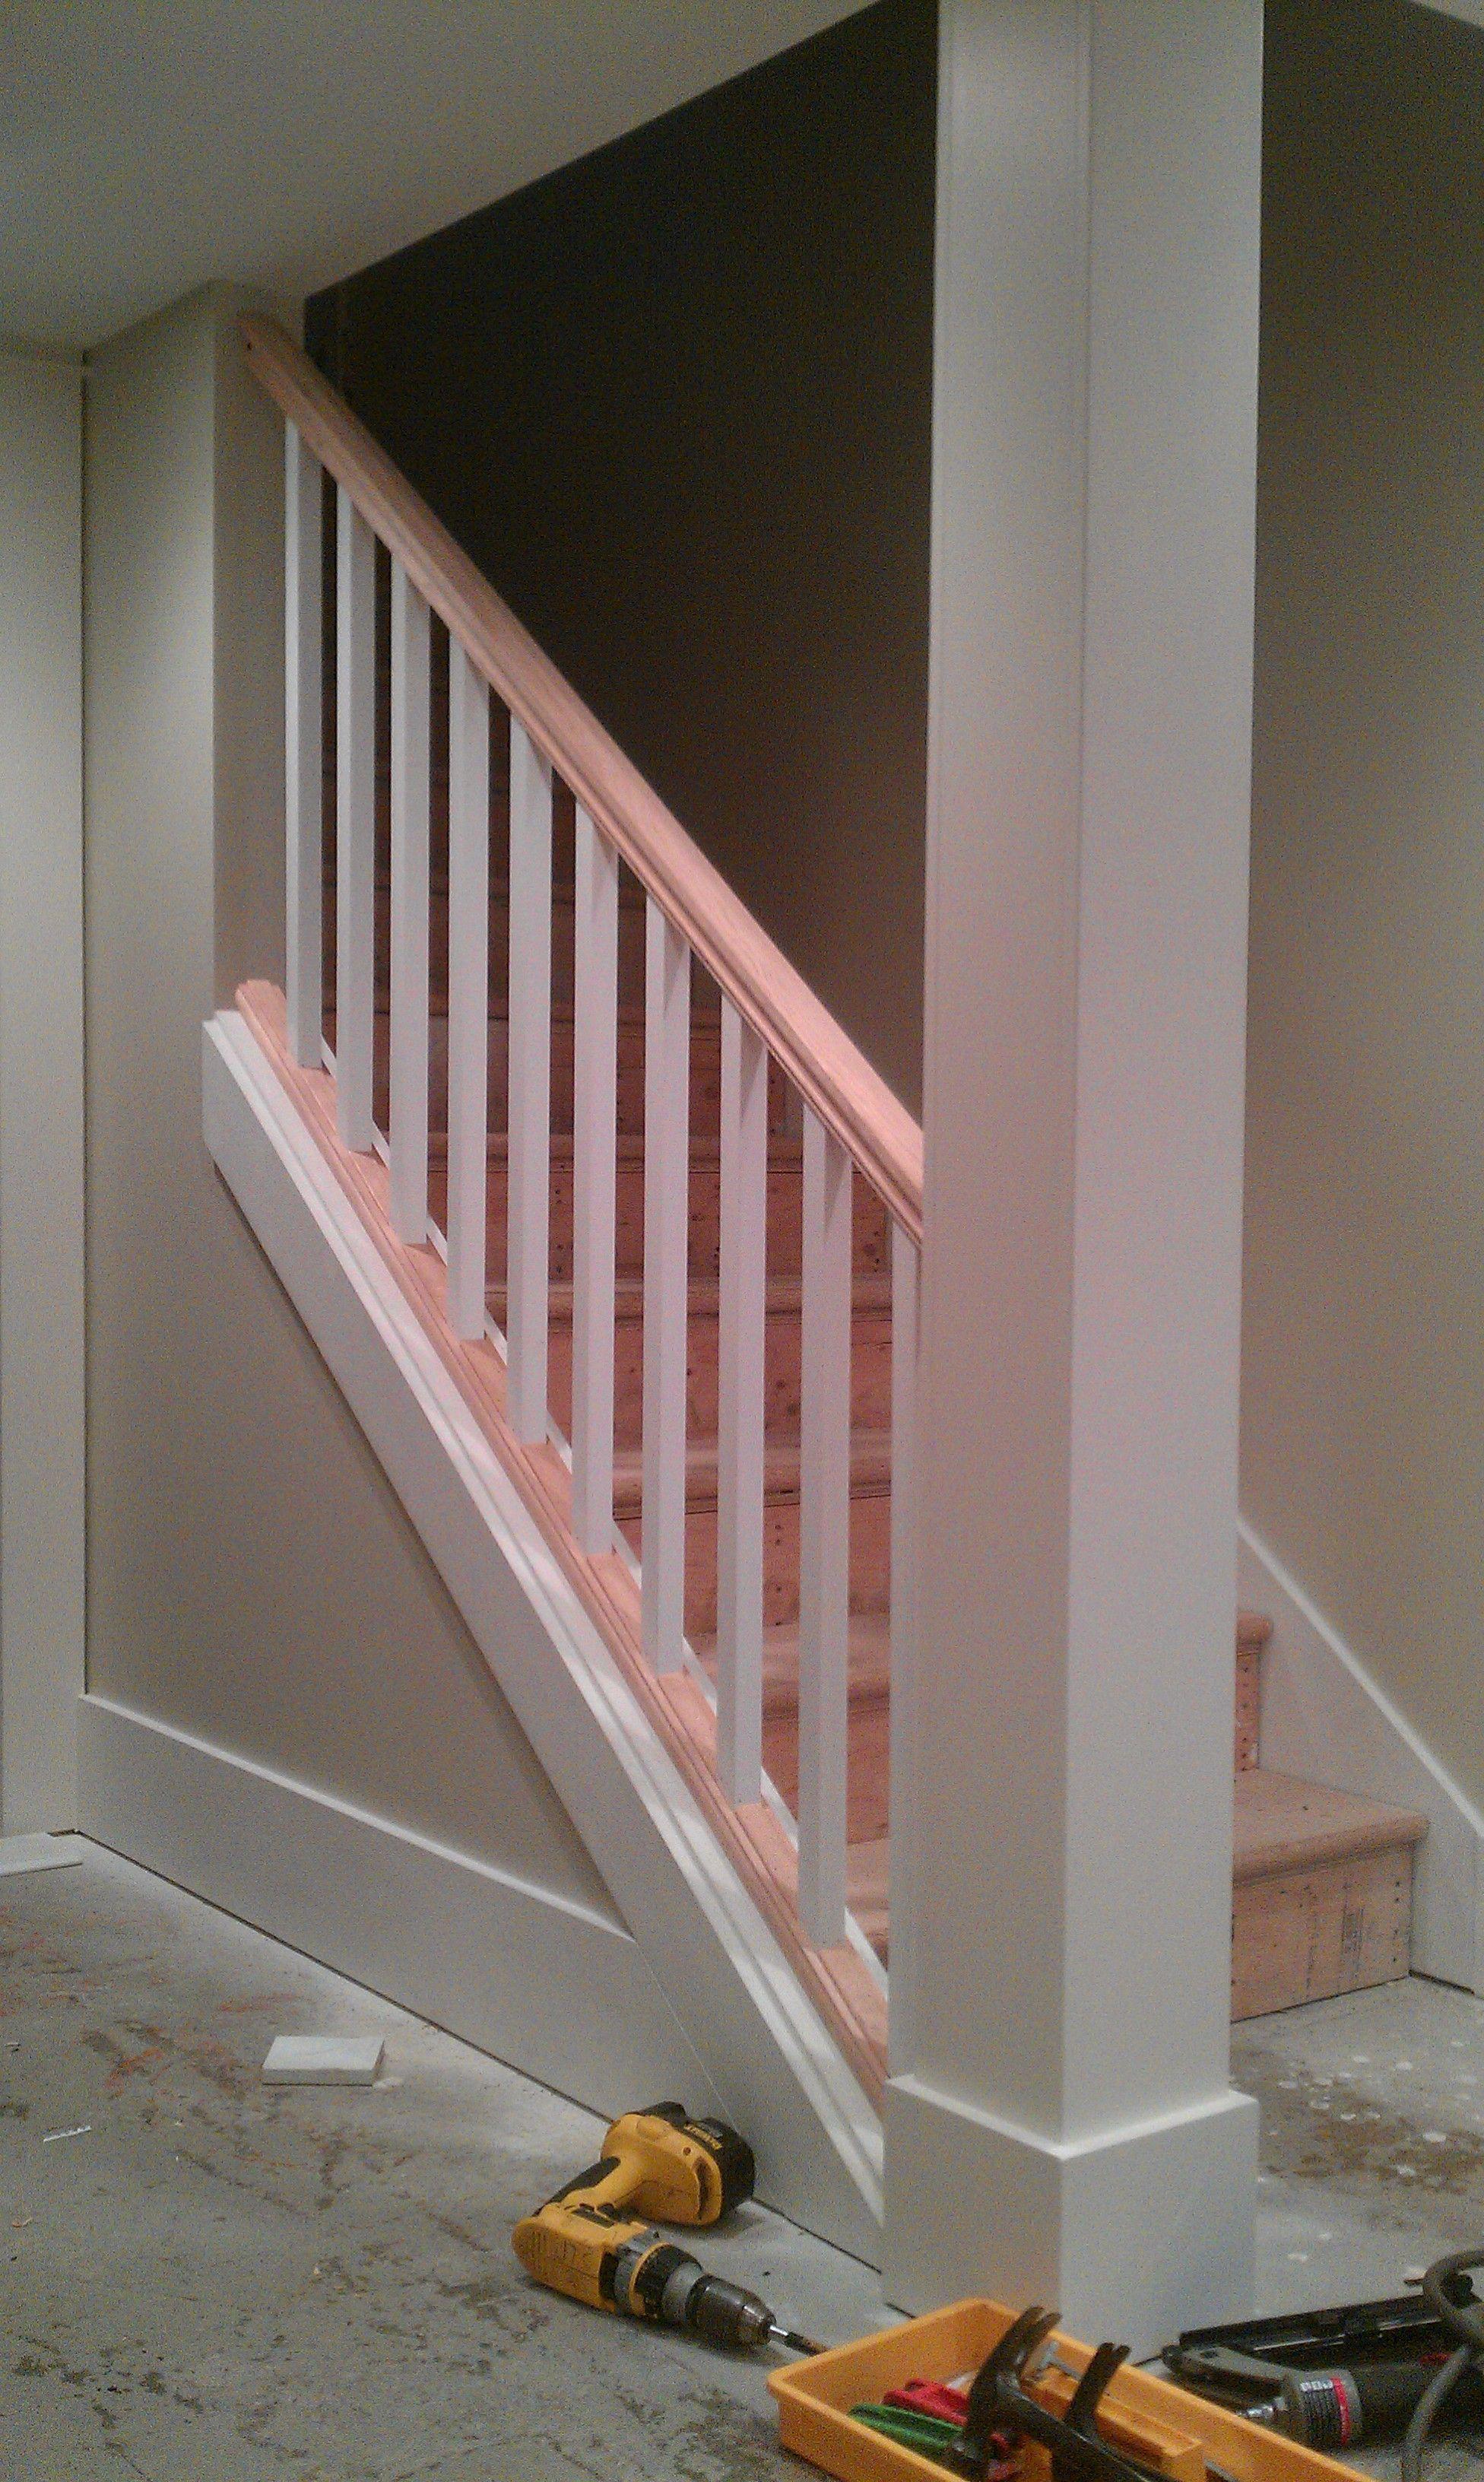 Basement Stair Lighting Pendant: Light For Stairs (stairway) Ideas, LED, Pendant, Hallway